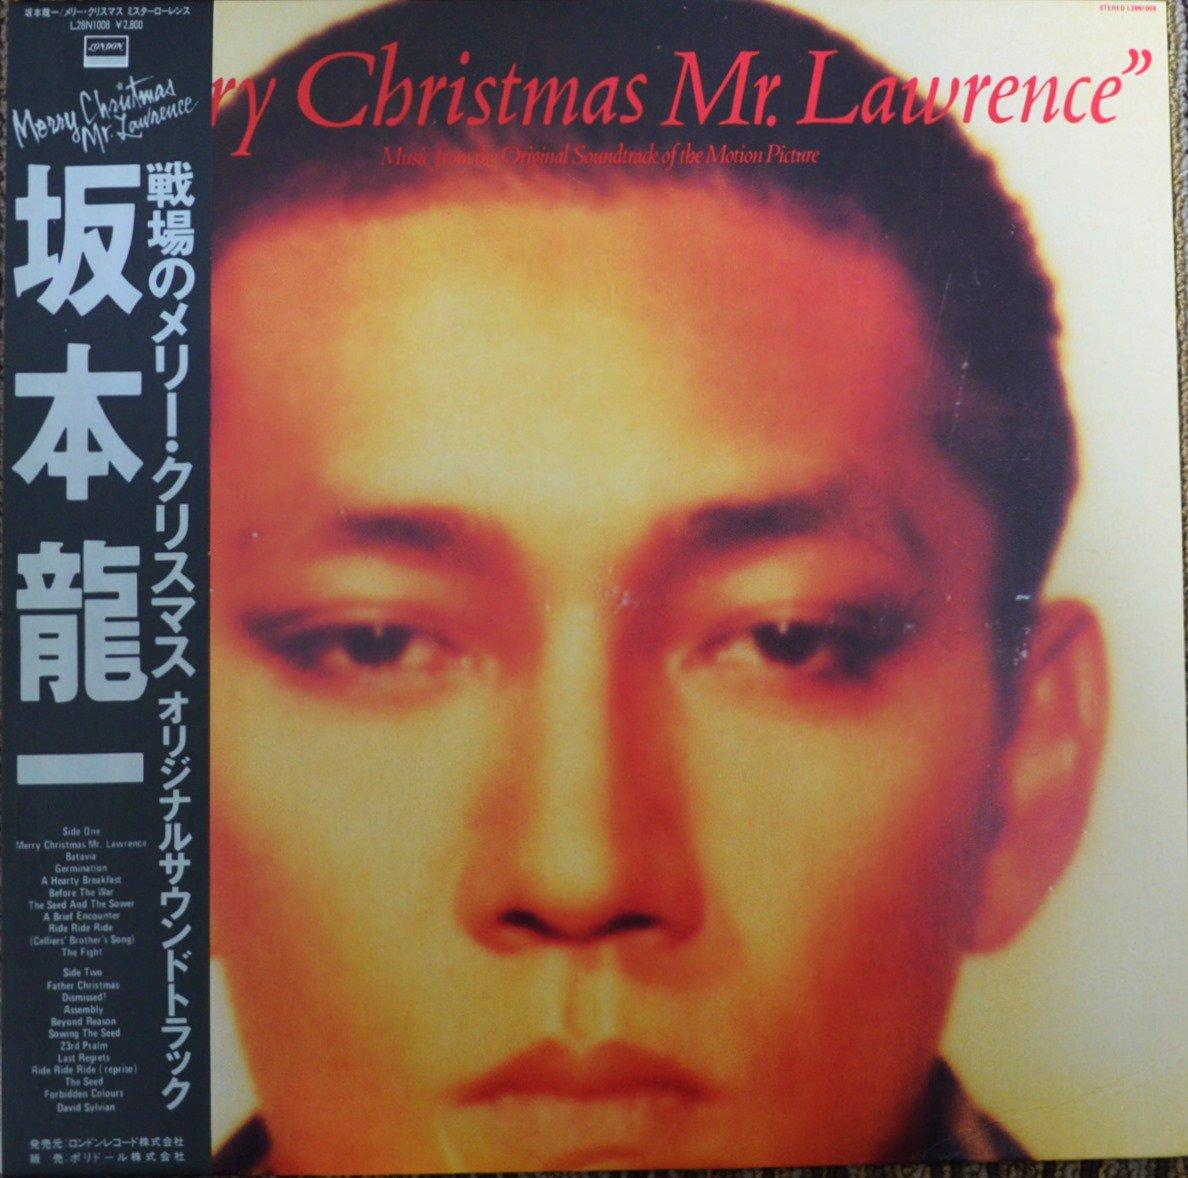 O.S.T. 坂本龍一 RYUICHI SAKAMOTO / 戦場のメリー・クリスマス MERRY CHRISTMAS MR. LAWRENCE (LP)